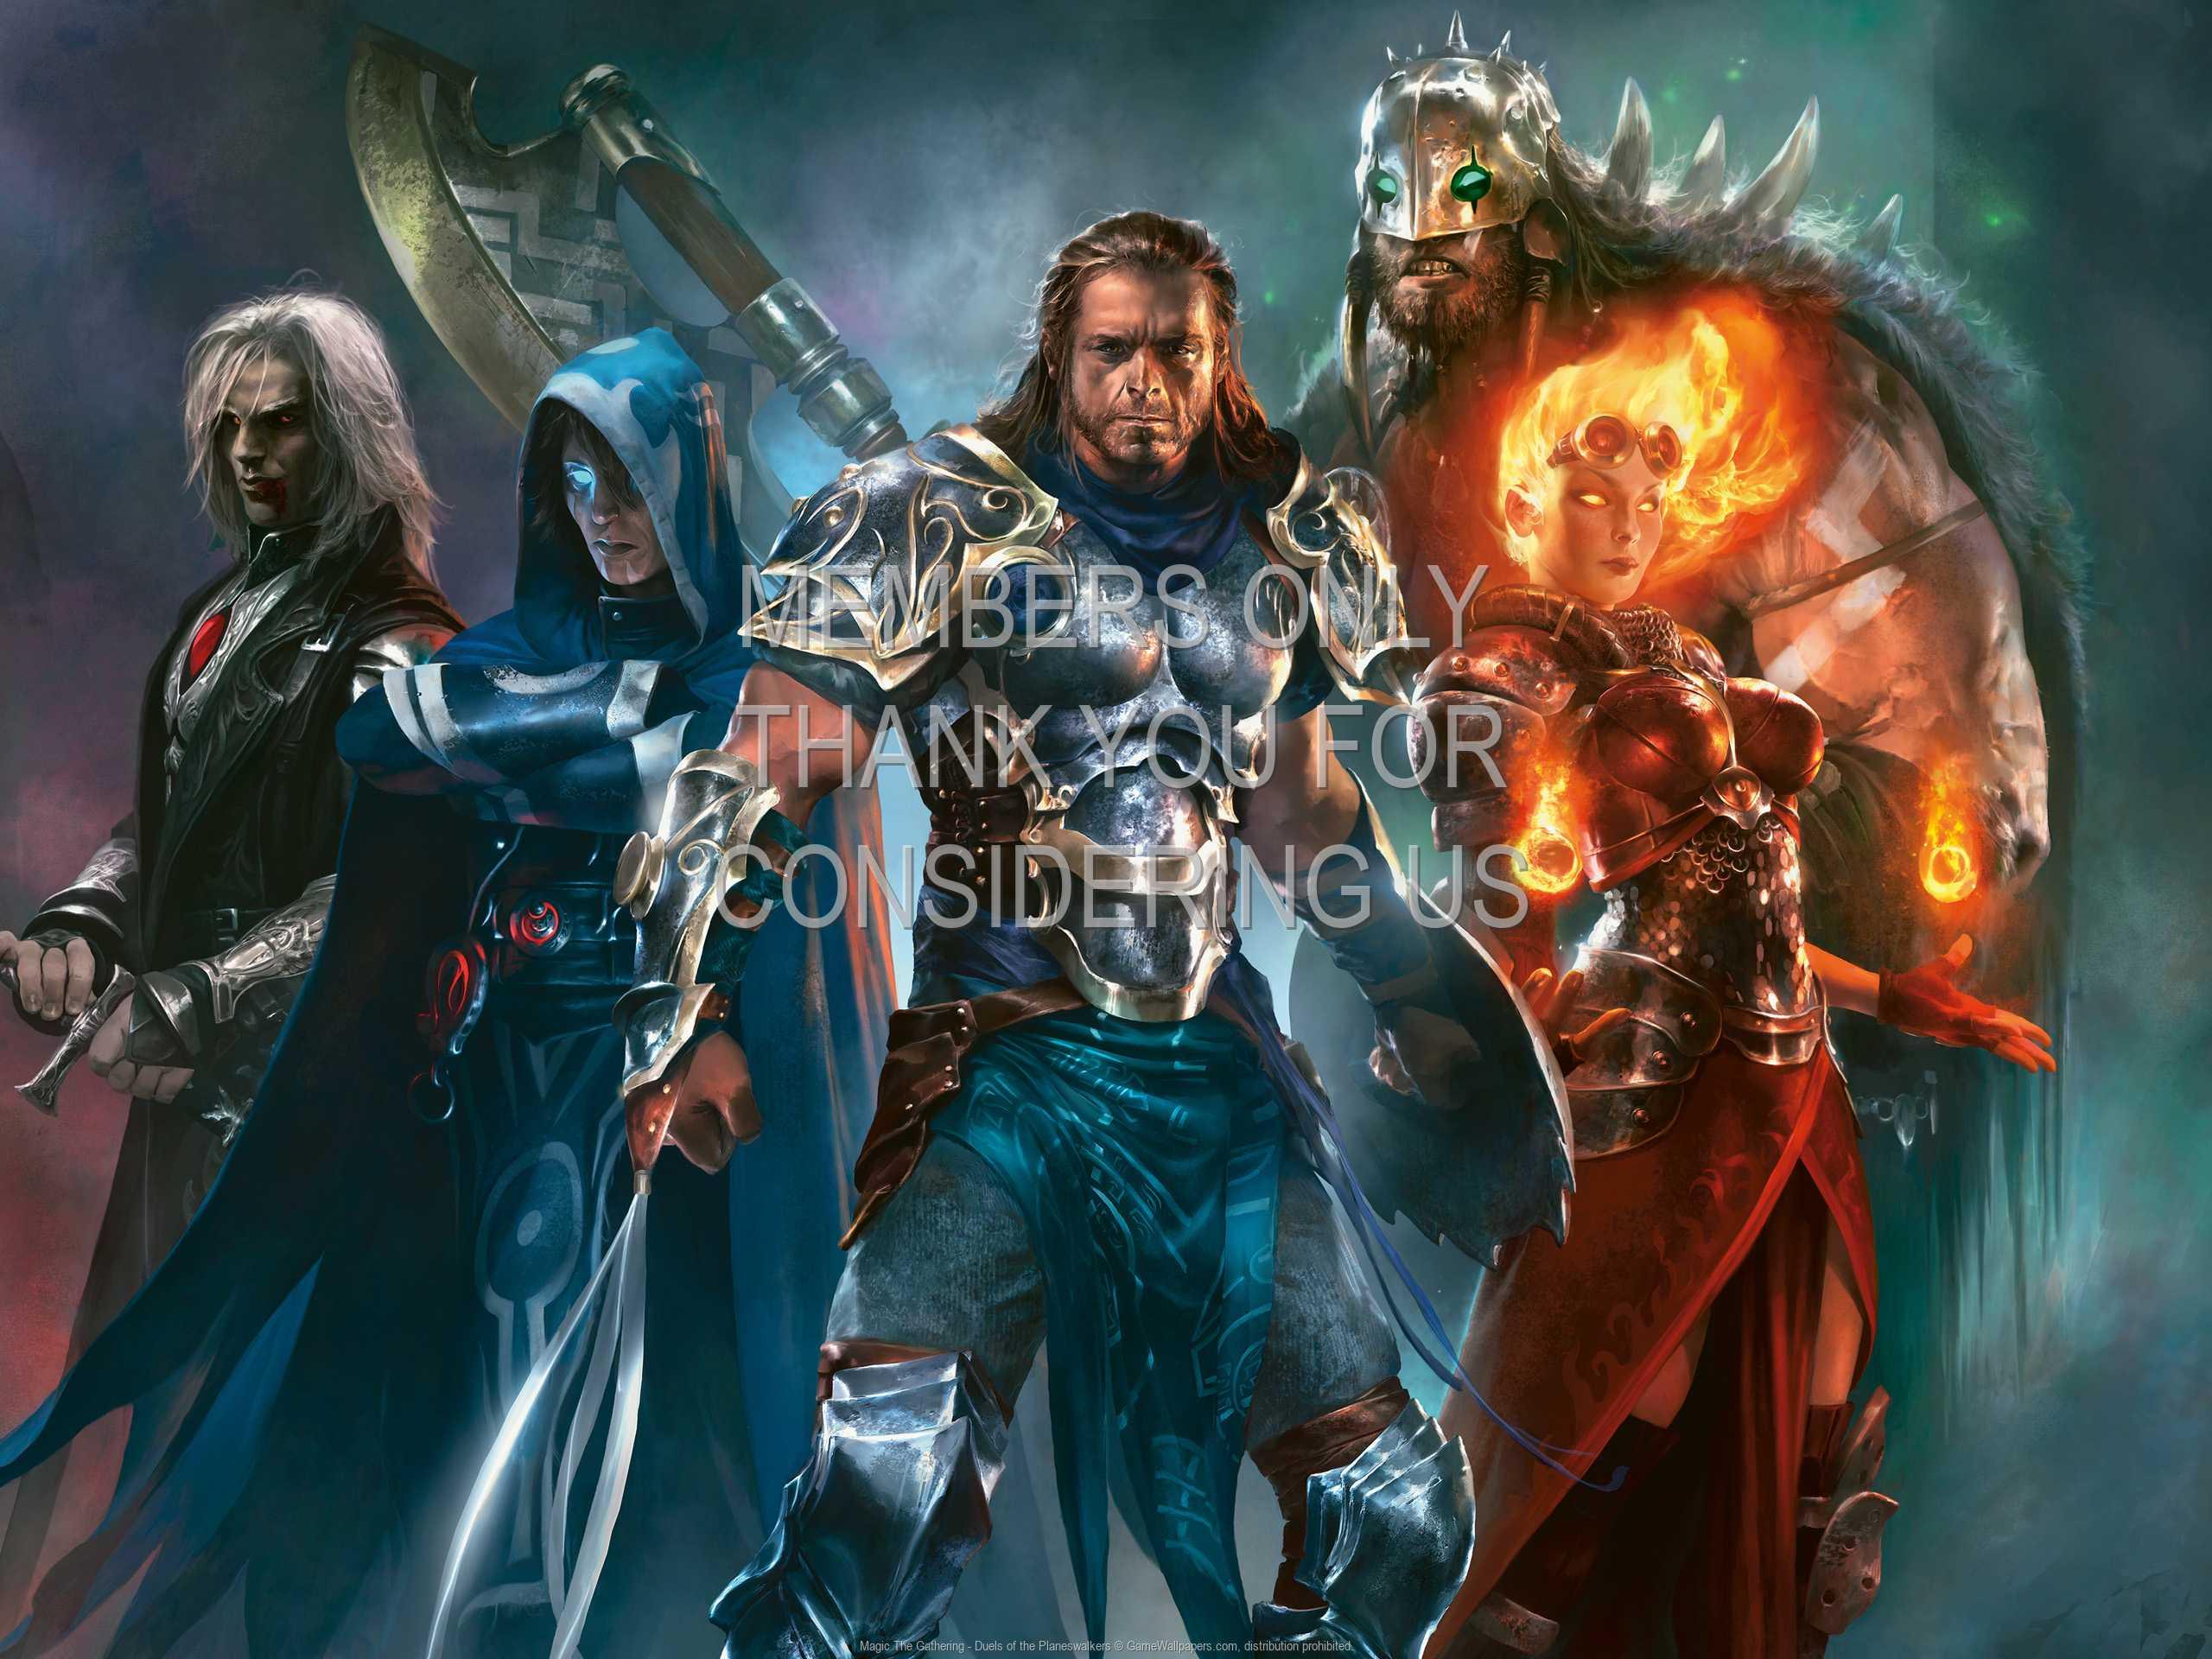 Magic: The Gathering - Duels of the Planeswalkers 1080p Horizontal Handy Hintergrundbild 01